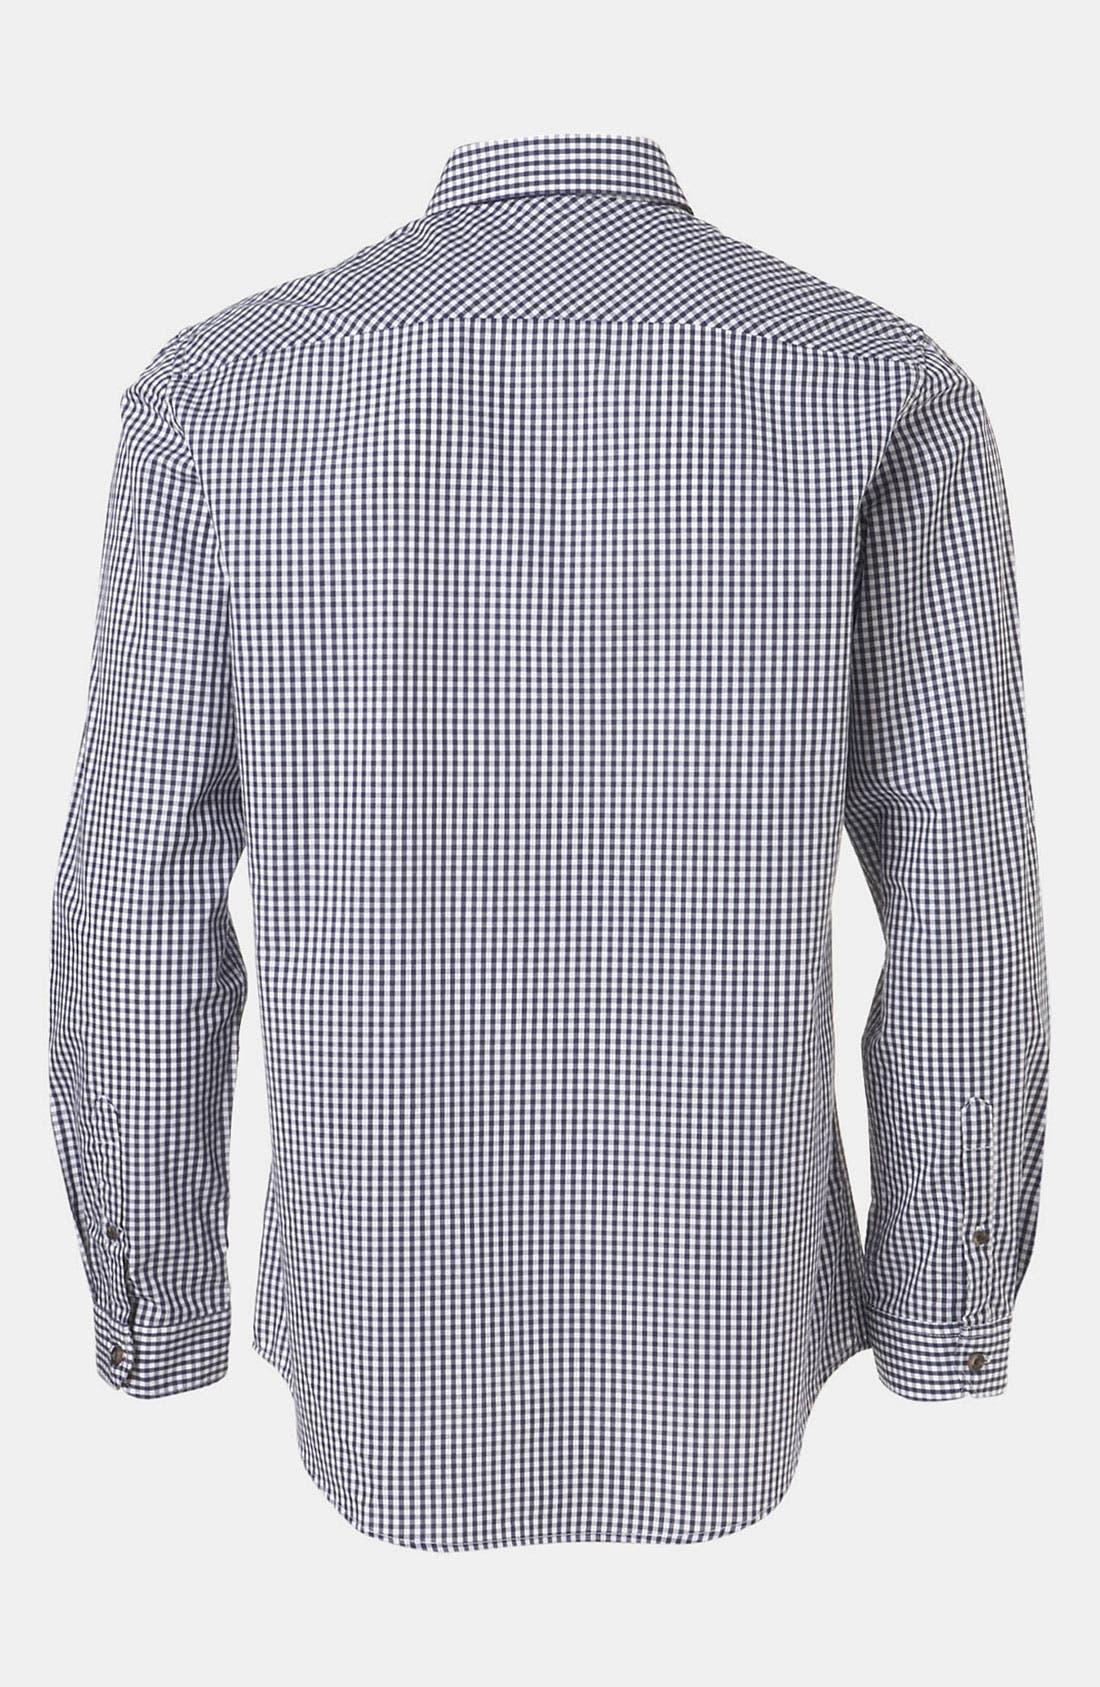 Alternate Image 2  - Topman Extra Trim Gingham Check Shirt